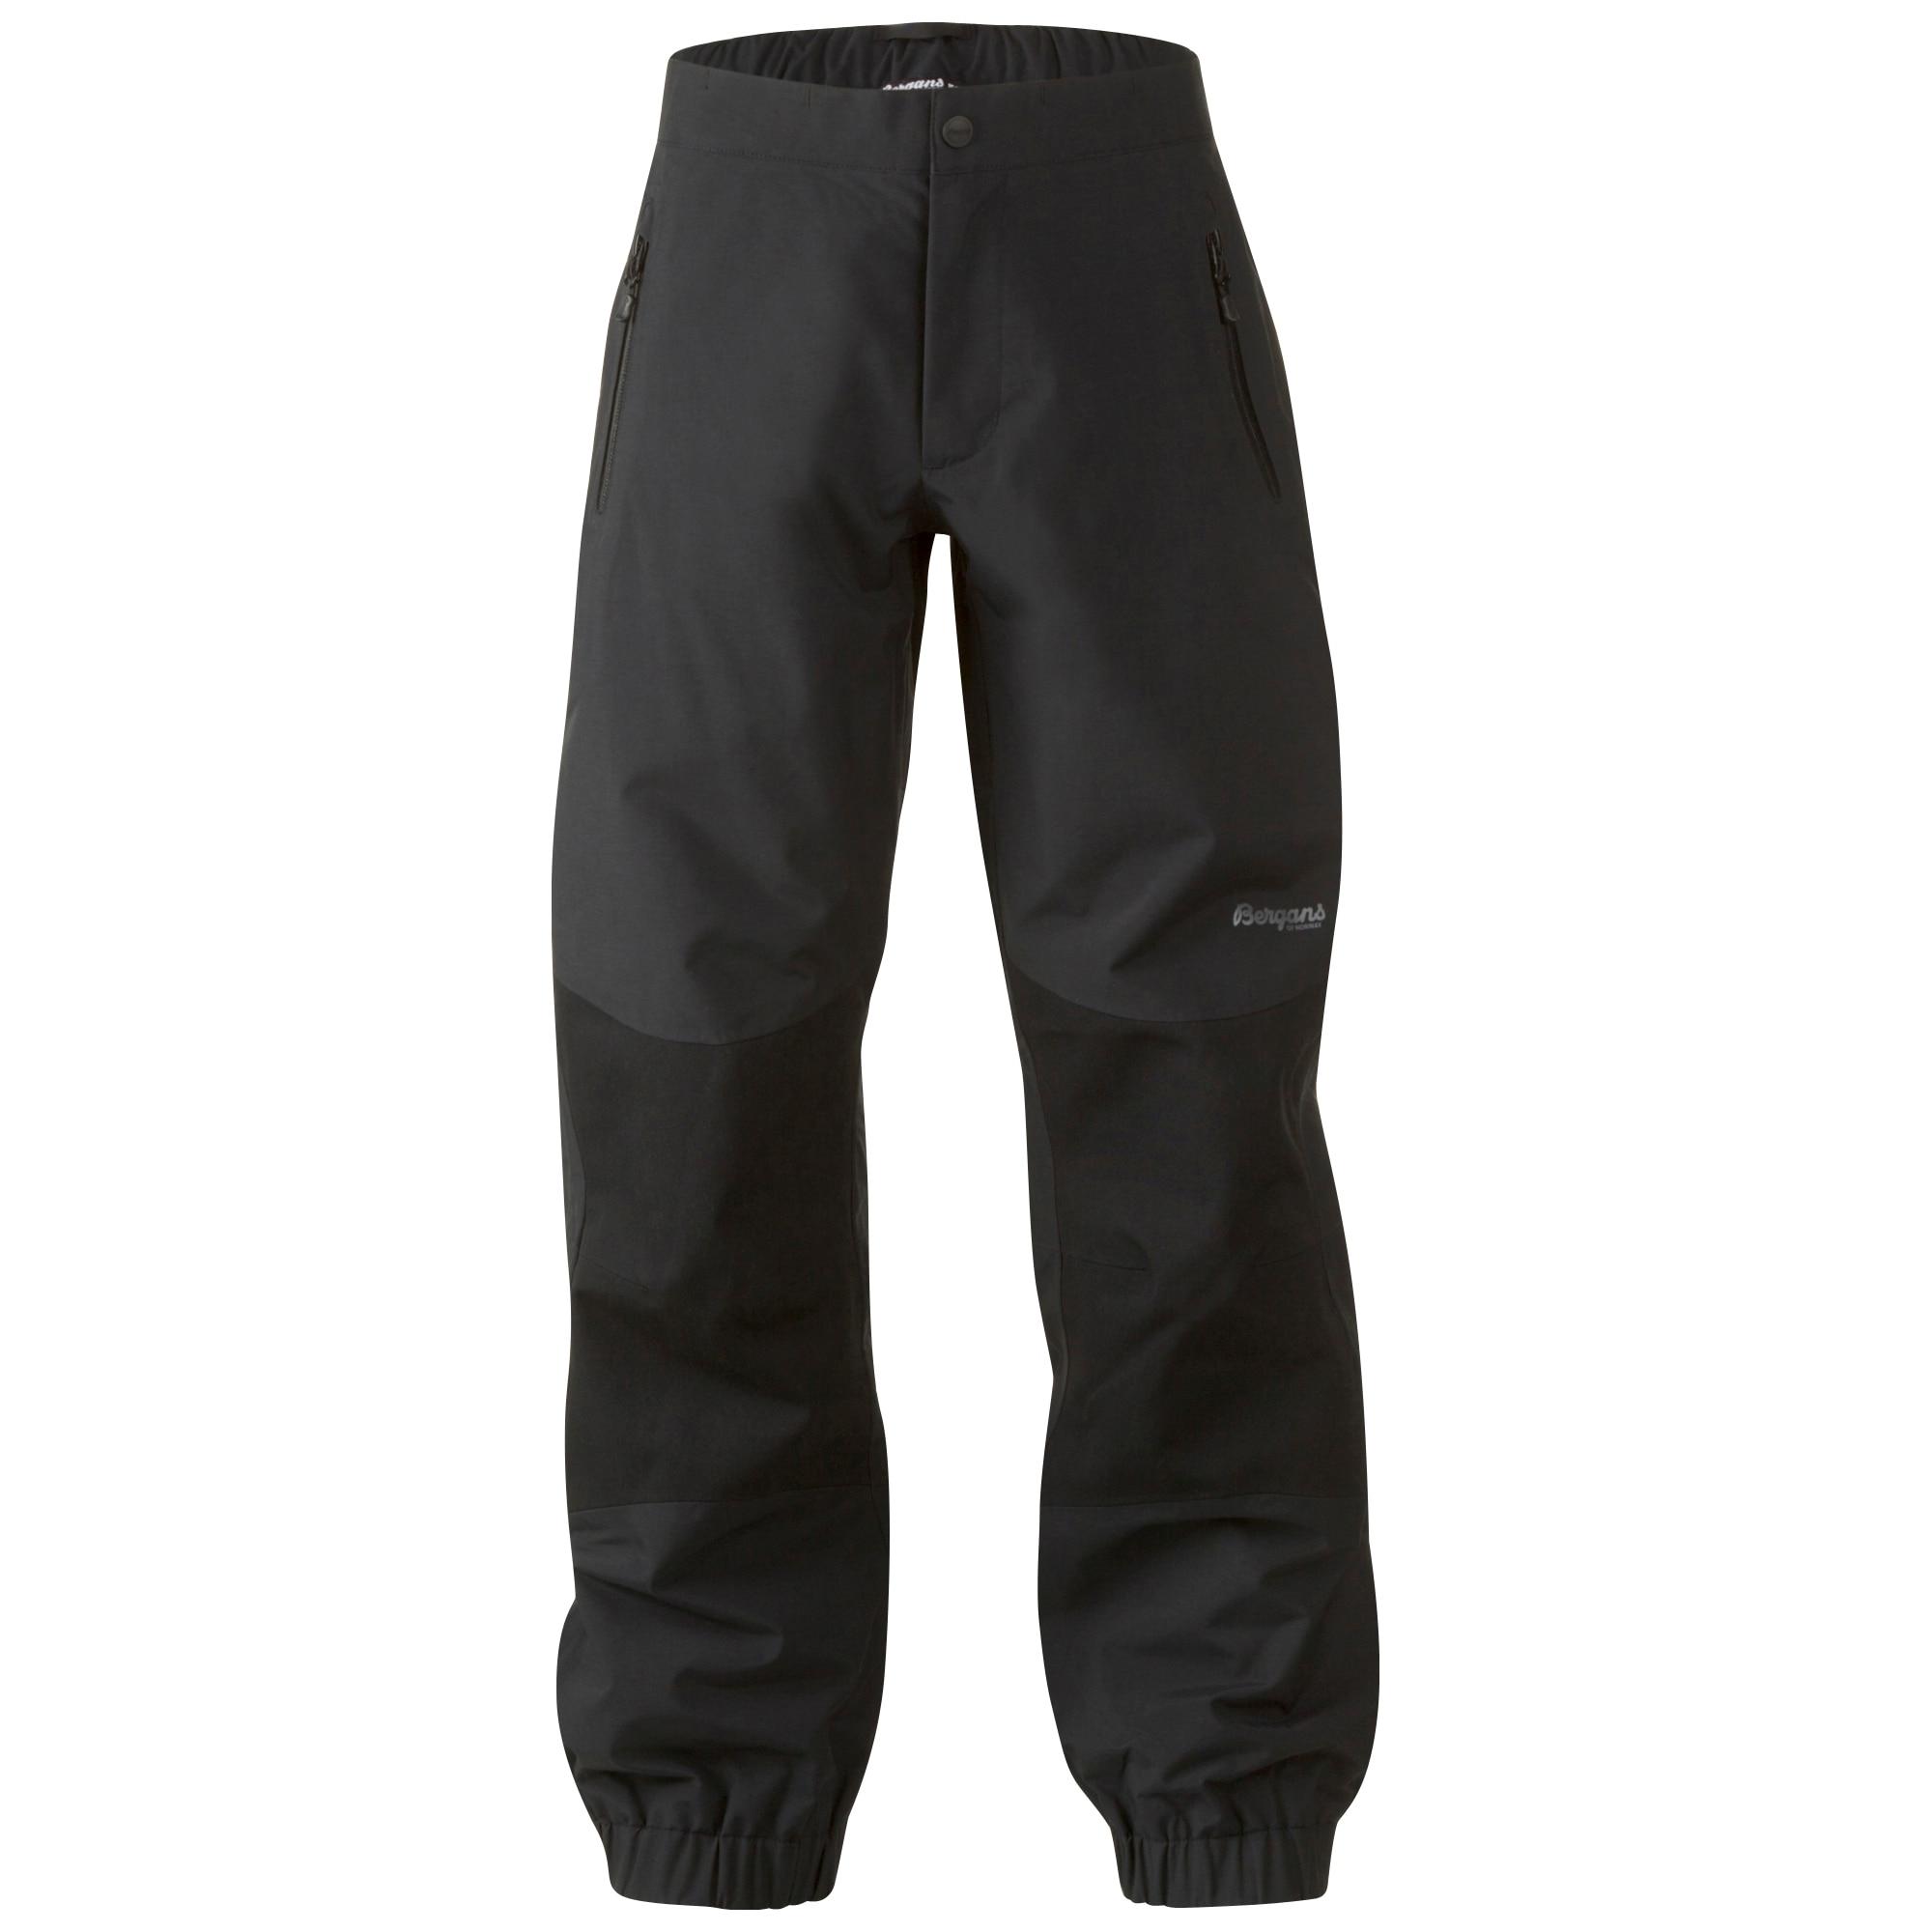 Evje Youth Pants